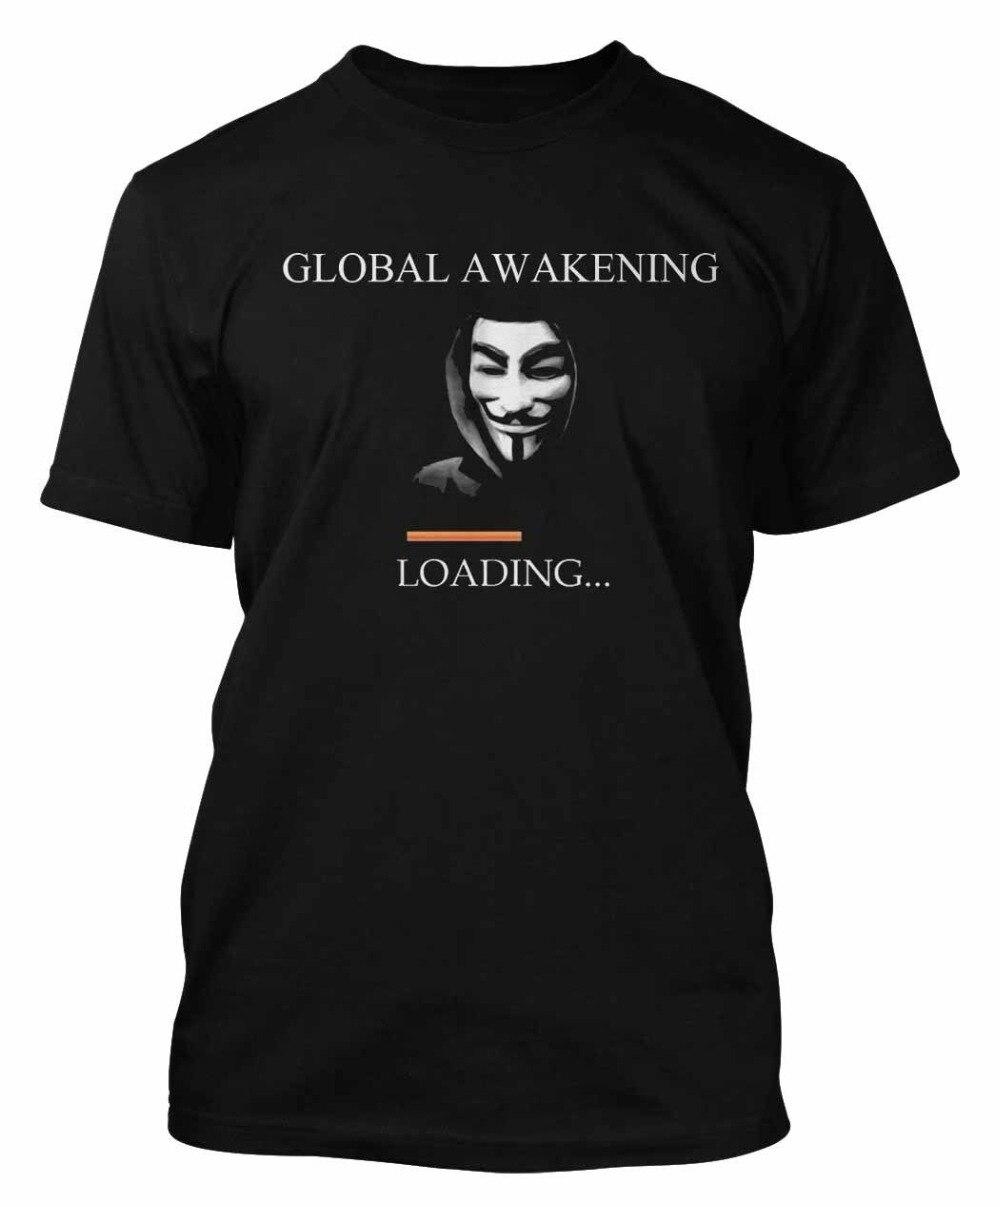 Camiseta anónima V For Vendetta Mask Mens We Are The 99% camiseta Dtg9 moda camiseta nueva camisetas novedad o-cuello Tops 80S camisetas